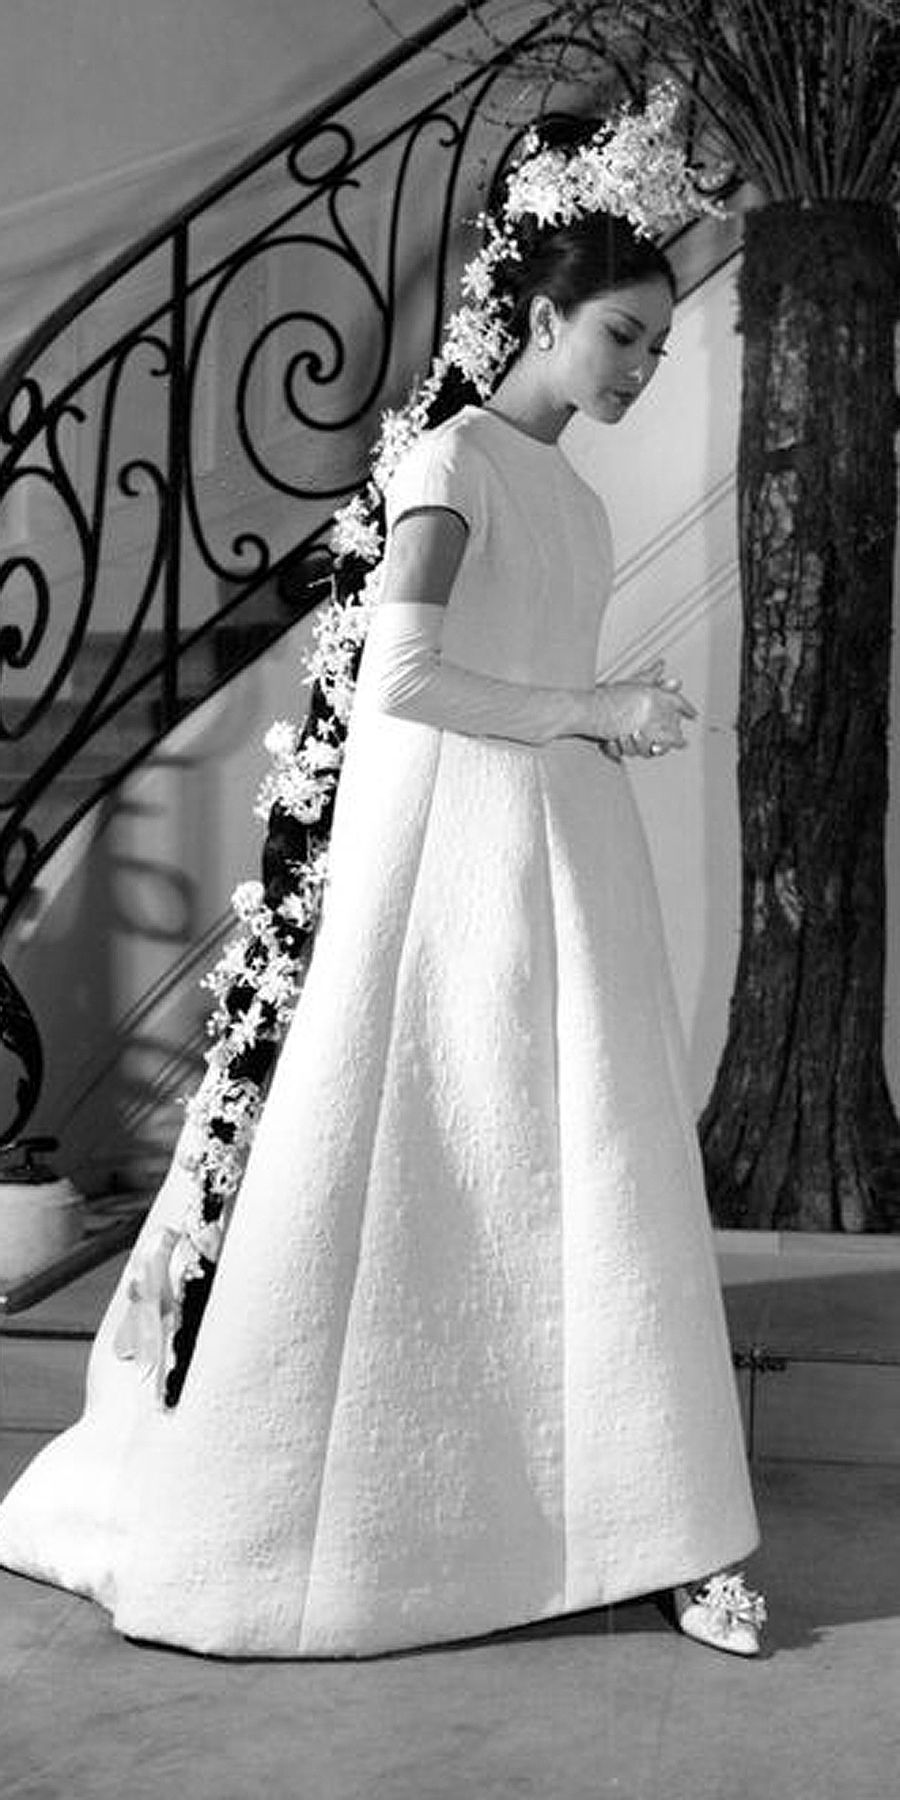 1960s Cream Lace Short Wedding Dress Mad Men Fashion Summer Etsy Short Wedding Dress 1960s Wedding Dresses Wedding Dresses [ 1500 x 824 Pixel ]